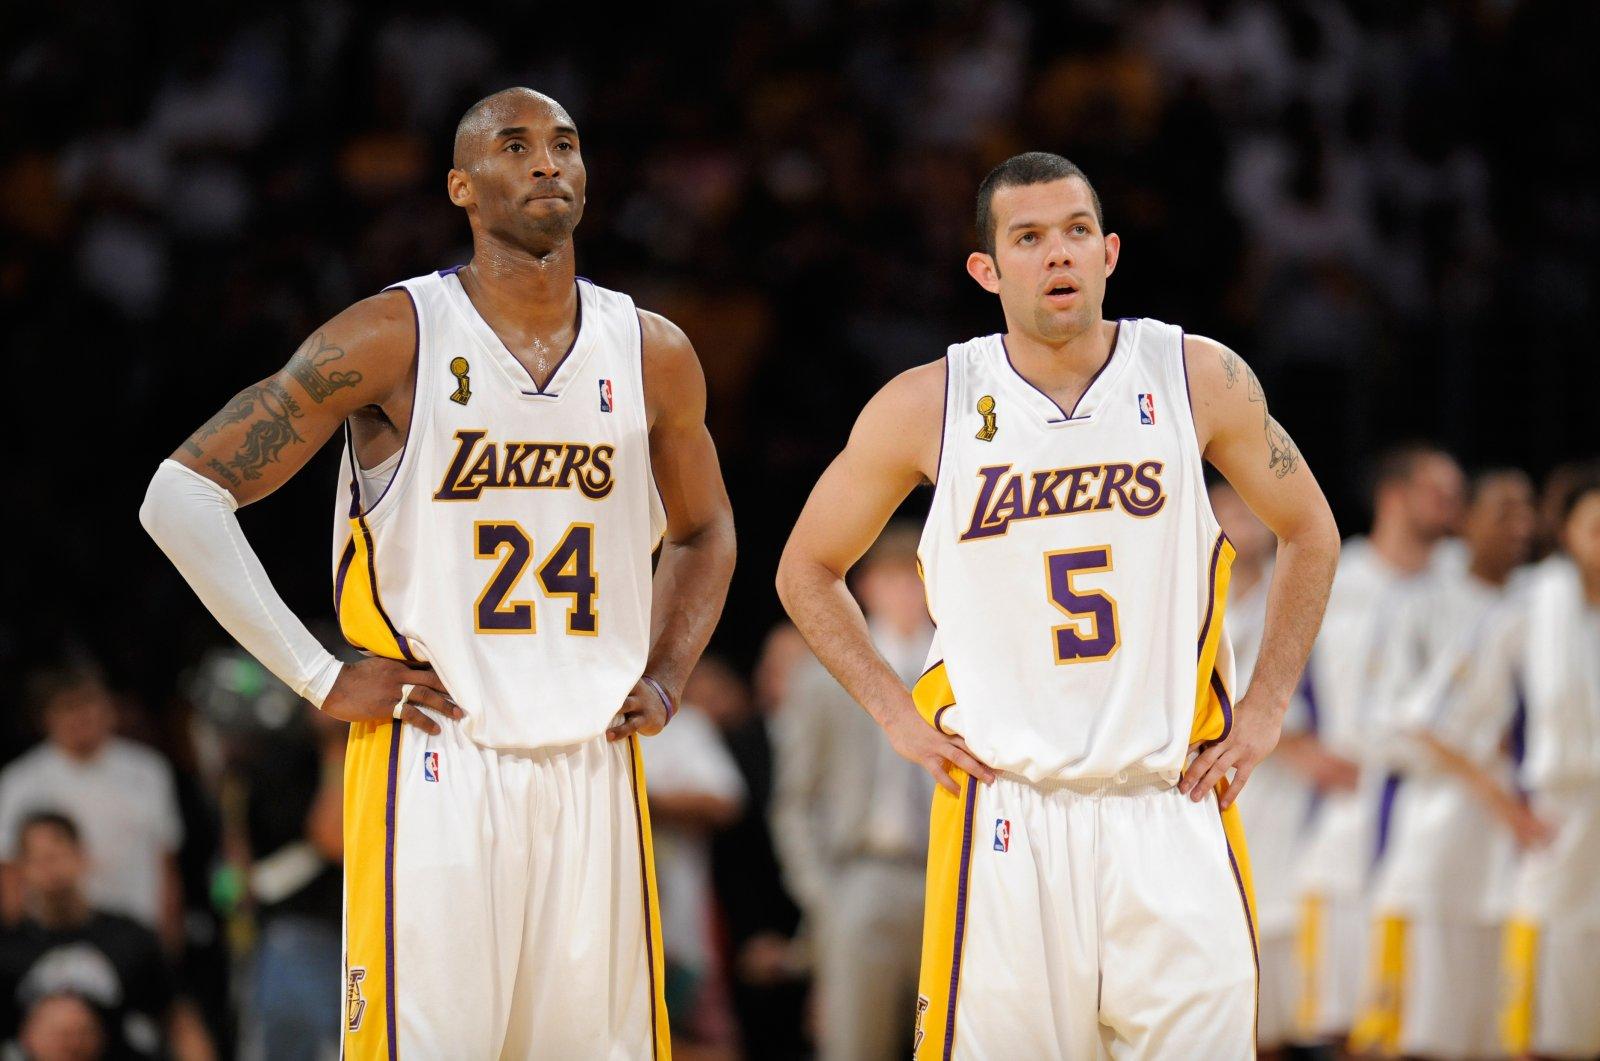 Los Angeles Lakers' Kobe Bryant (L) and Jordan Farmar during the Game 5 of NBA finals against Boston Celtics, Los Angeles, U.S., June 15, 2008. (AP Photo)